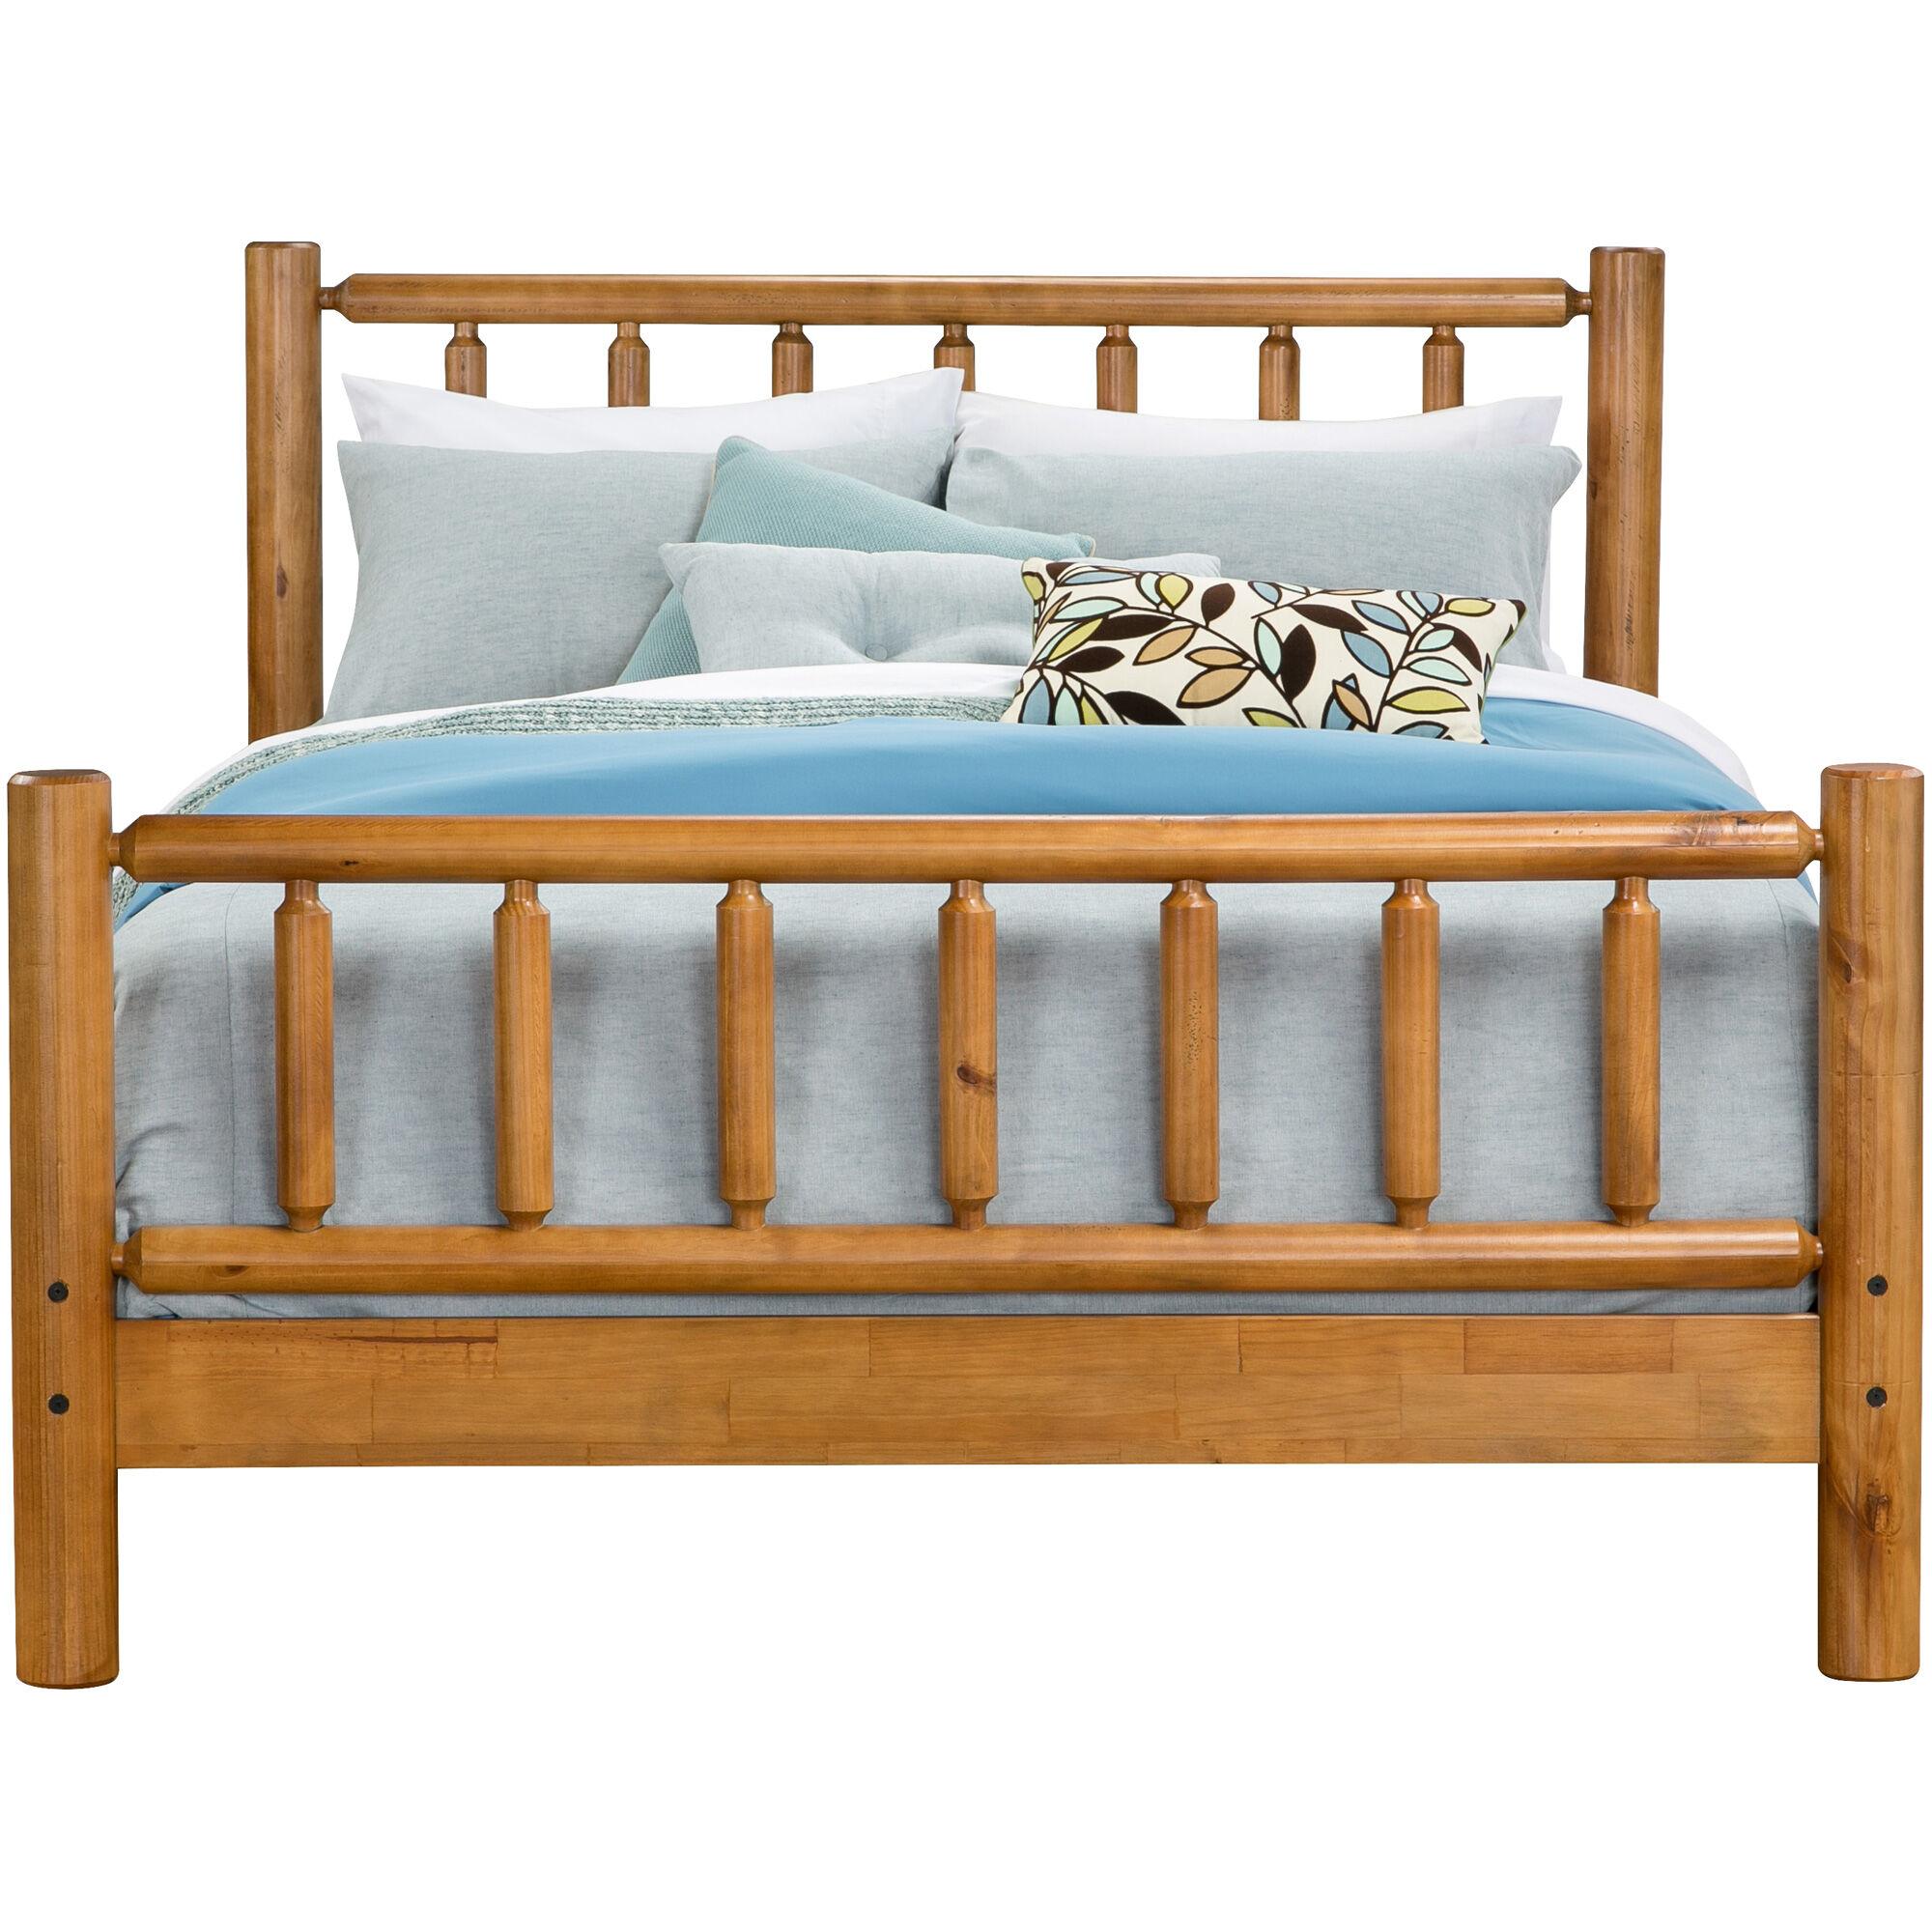 view mattress sale bed online beds furniture bedroom now for chelsea range slumberland plush